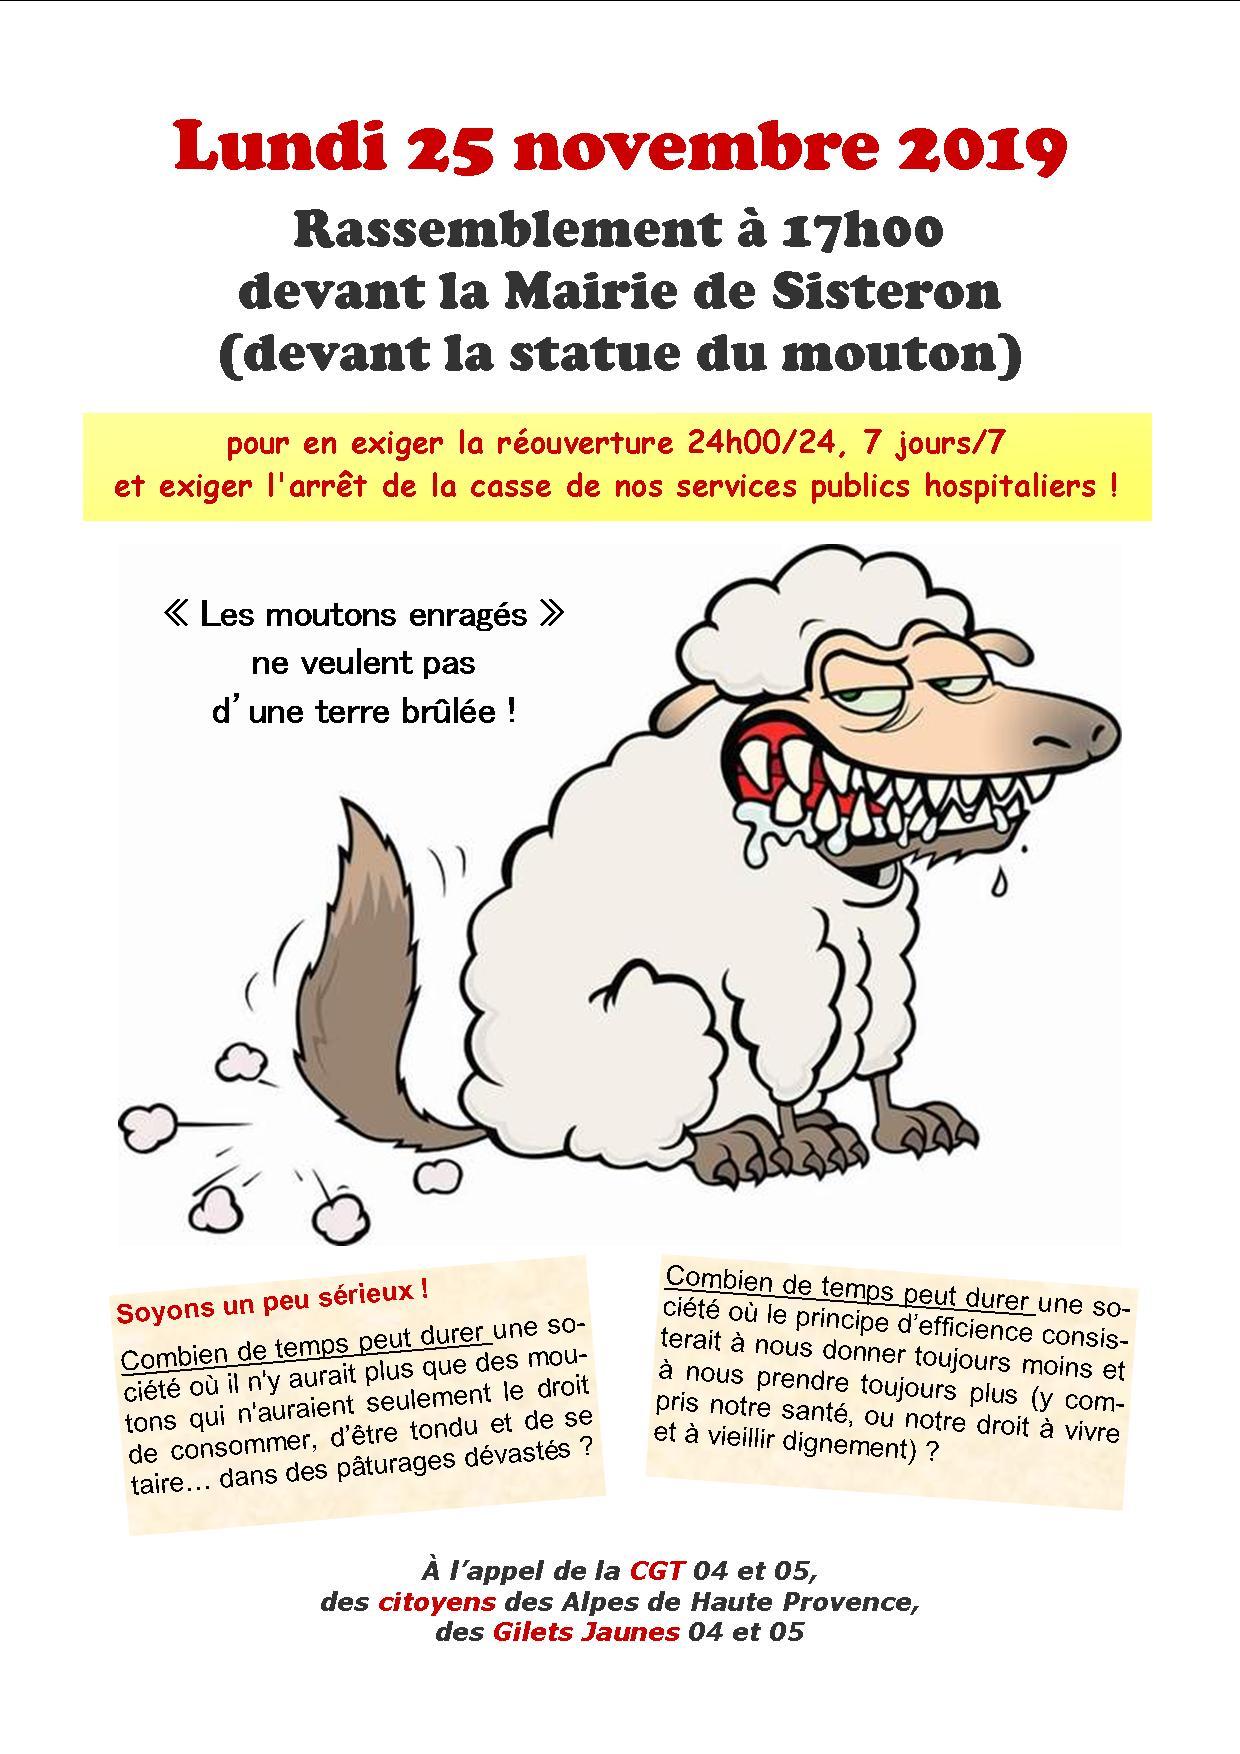 Tract moutons enragés urgences Sisteron 25 novembre 2019